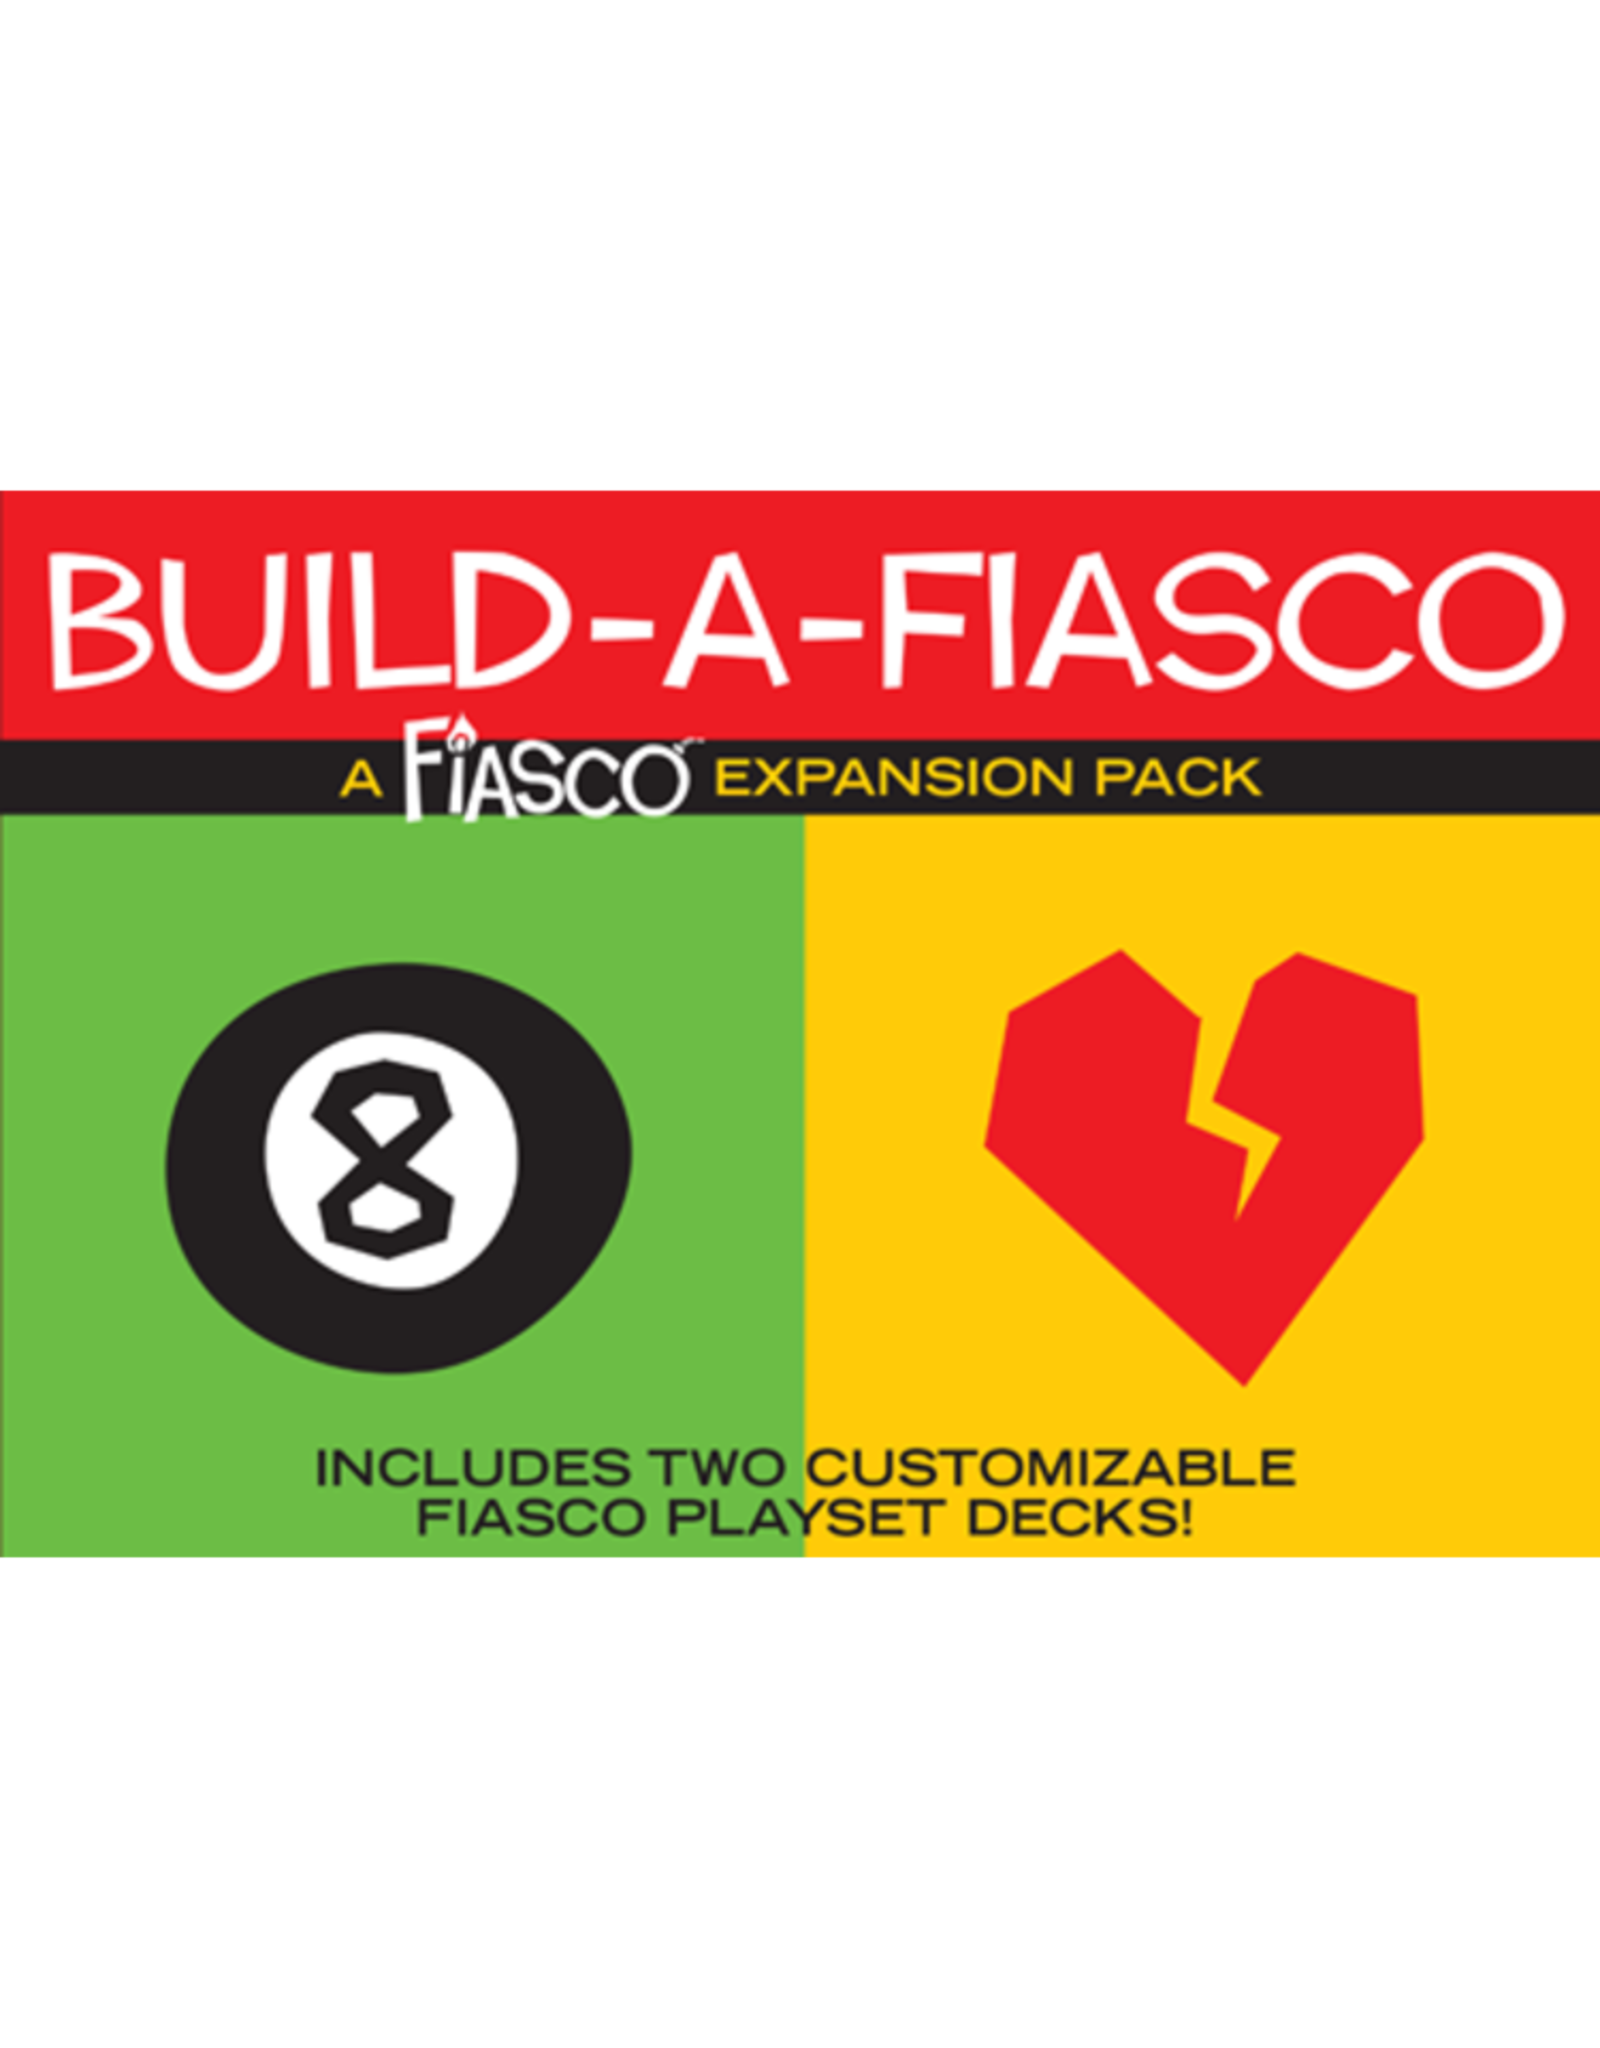 FIASCO BUILD-A-FIASCO EXPANSION PACK